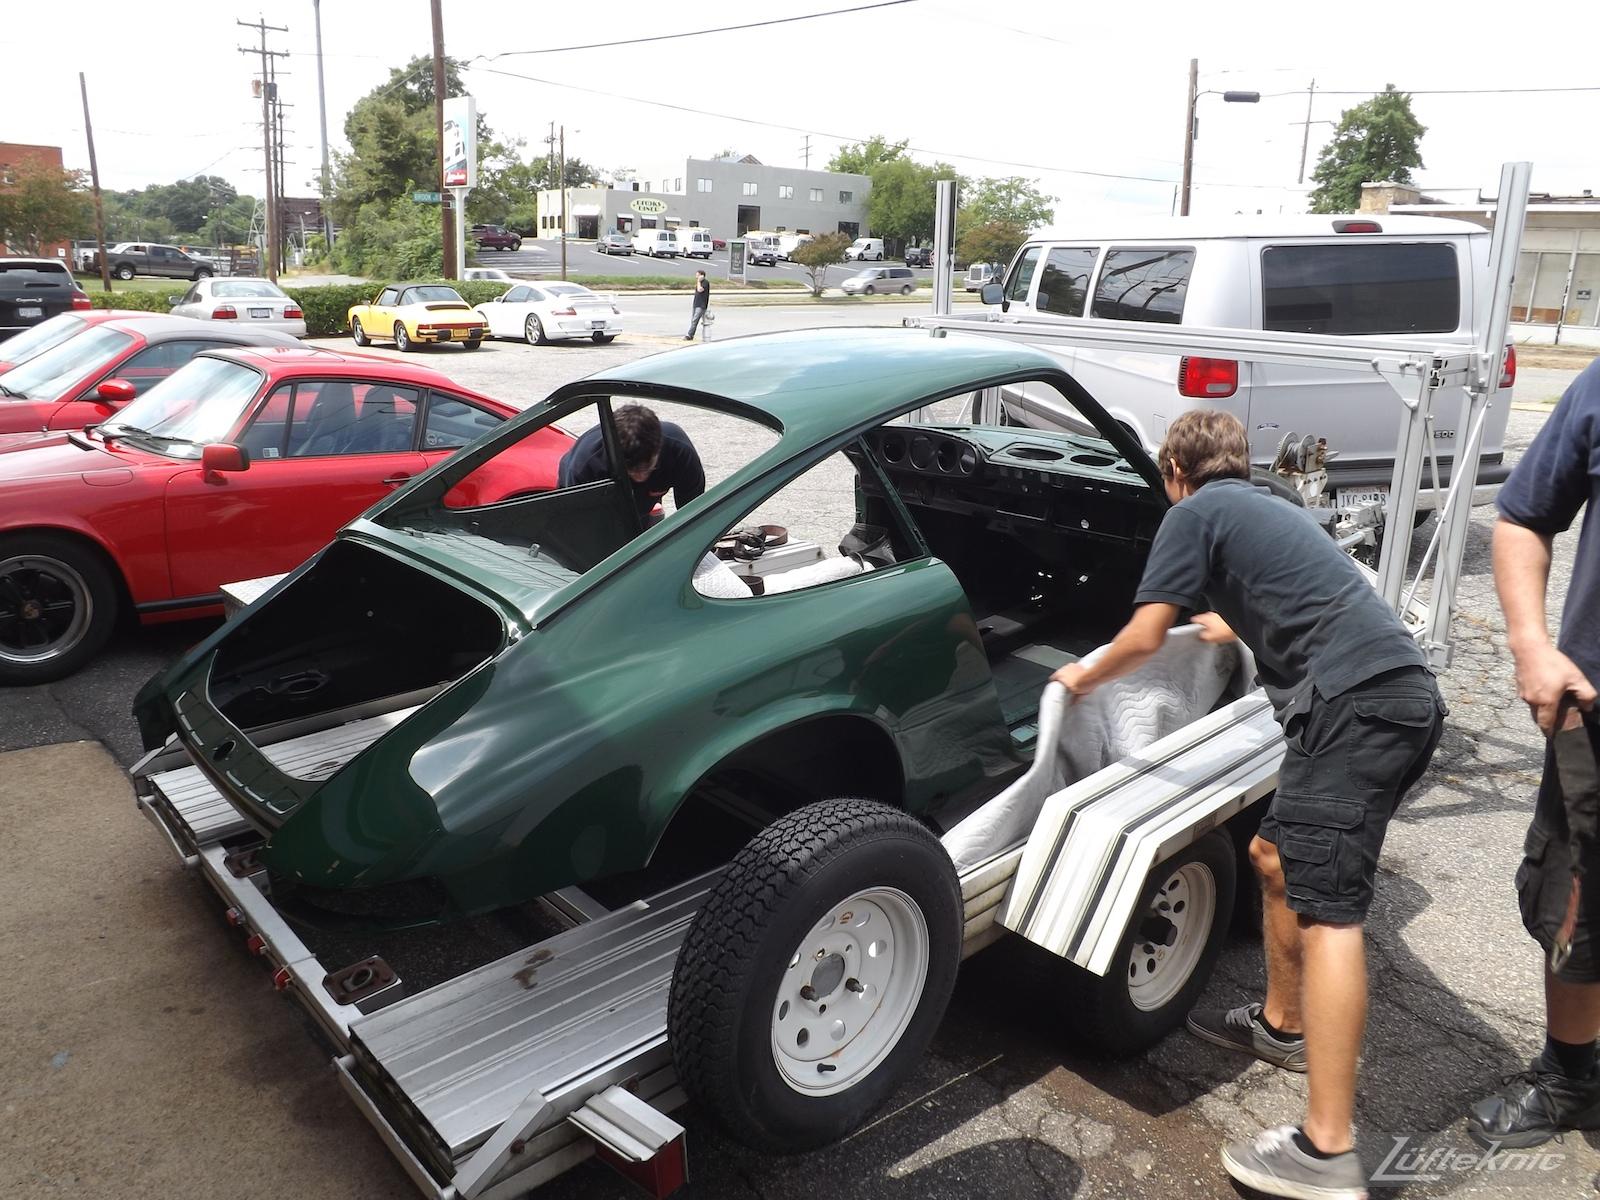 Unloading the freshly painted body shell of an Irish Green Porsche 912 undergoing restoration at Lufteknic.